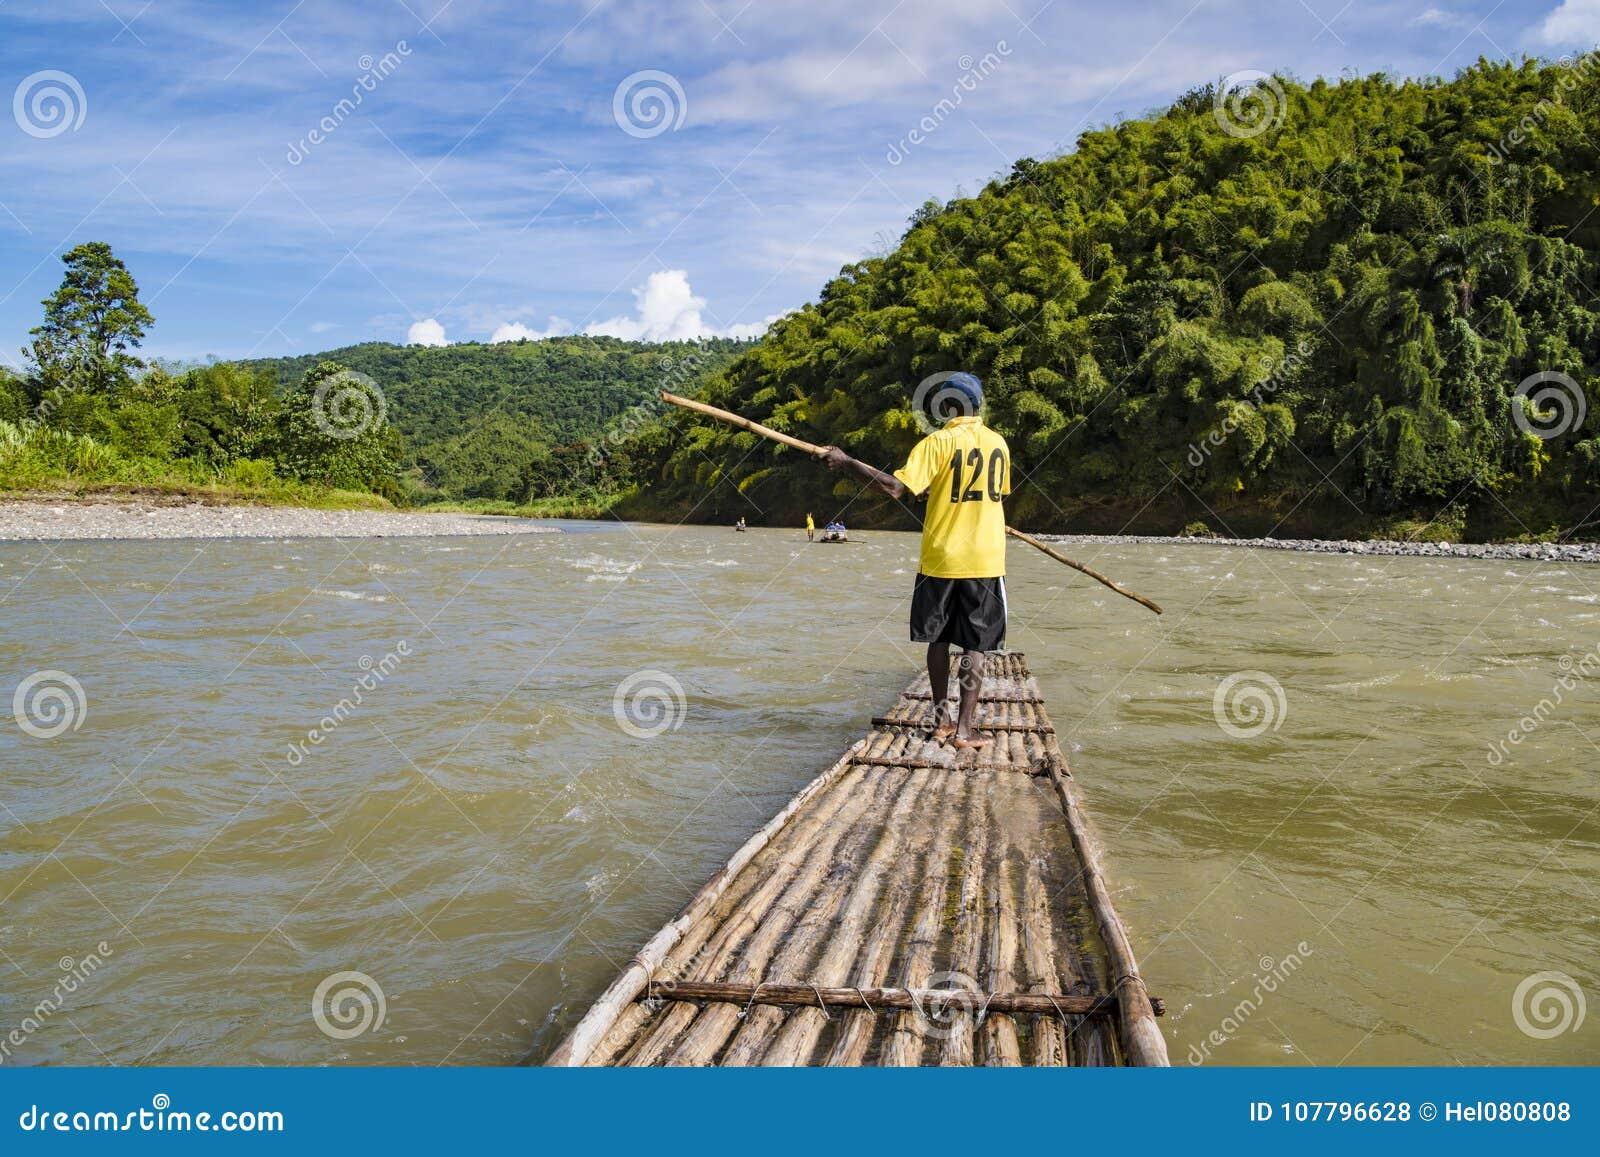 Rafting on bamboo rafts on Rio Grande, Port Antonio, Jamaica